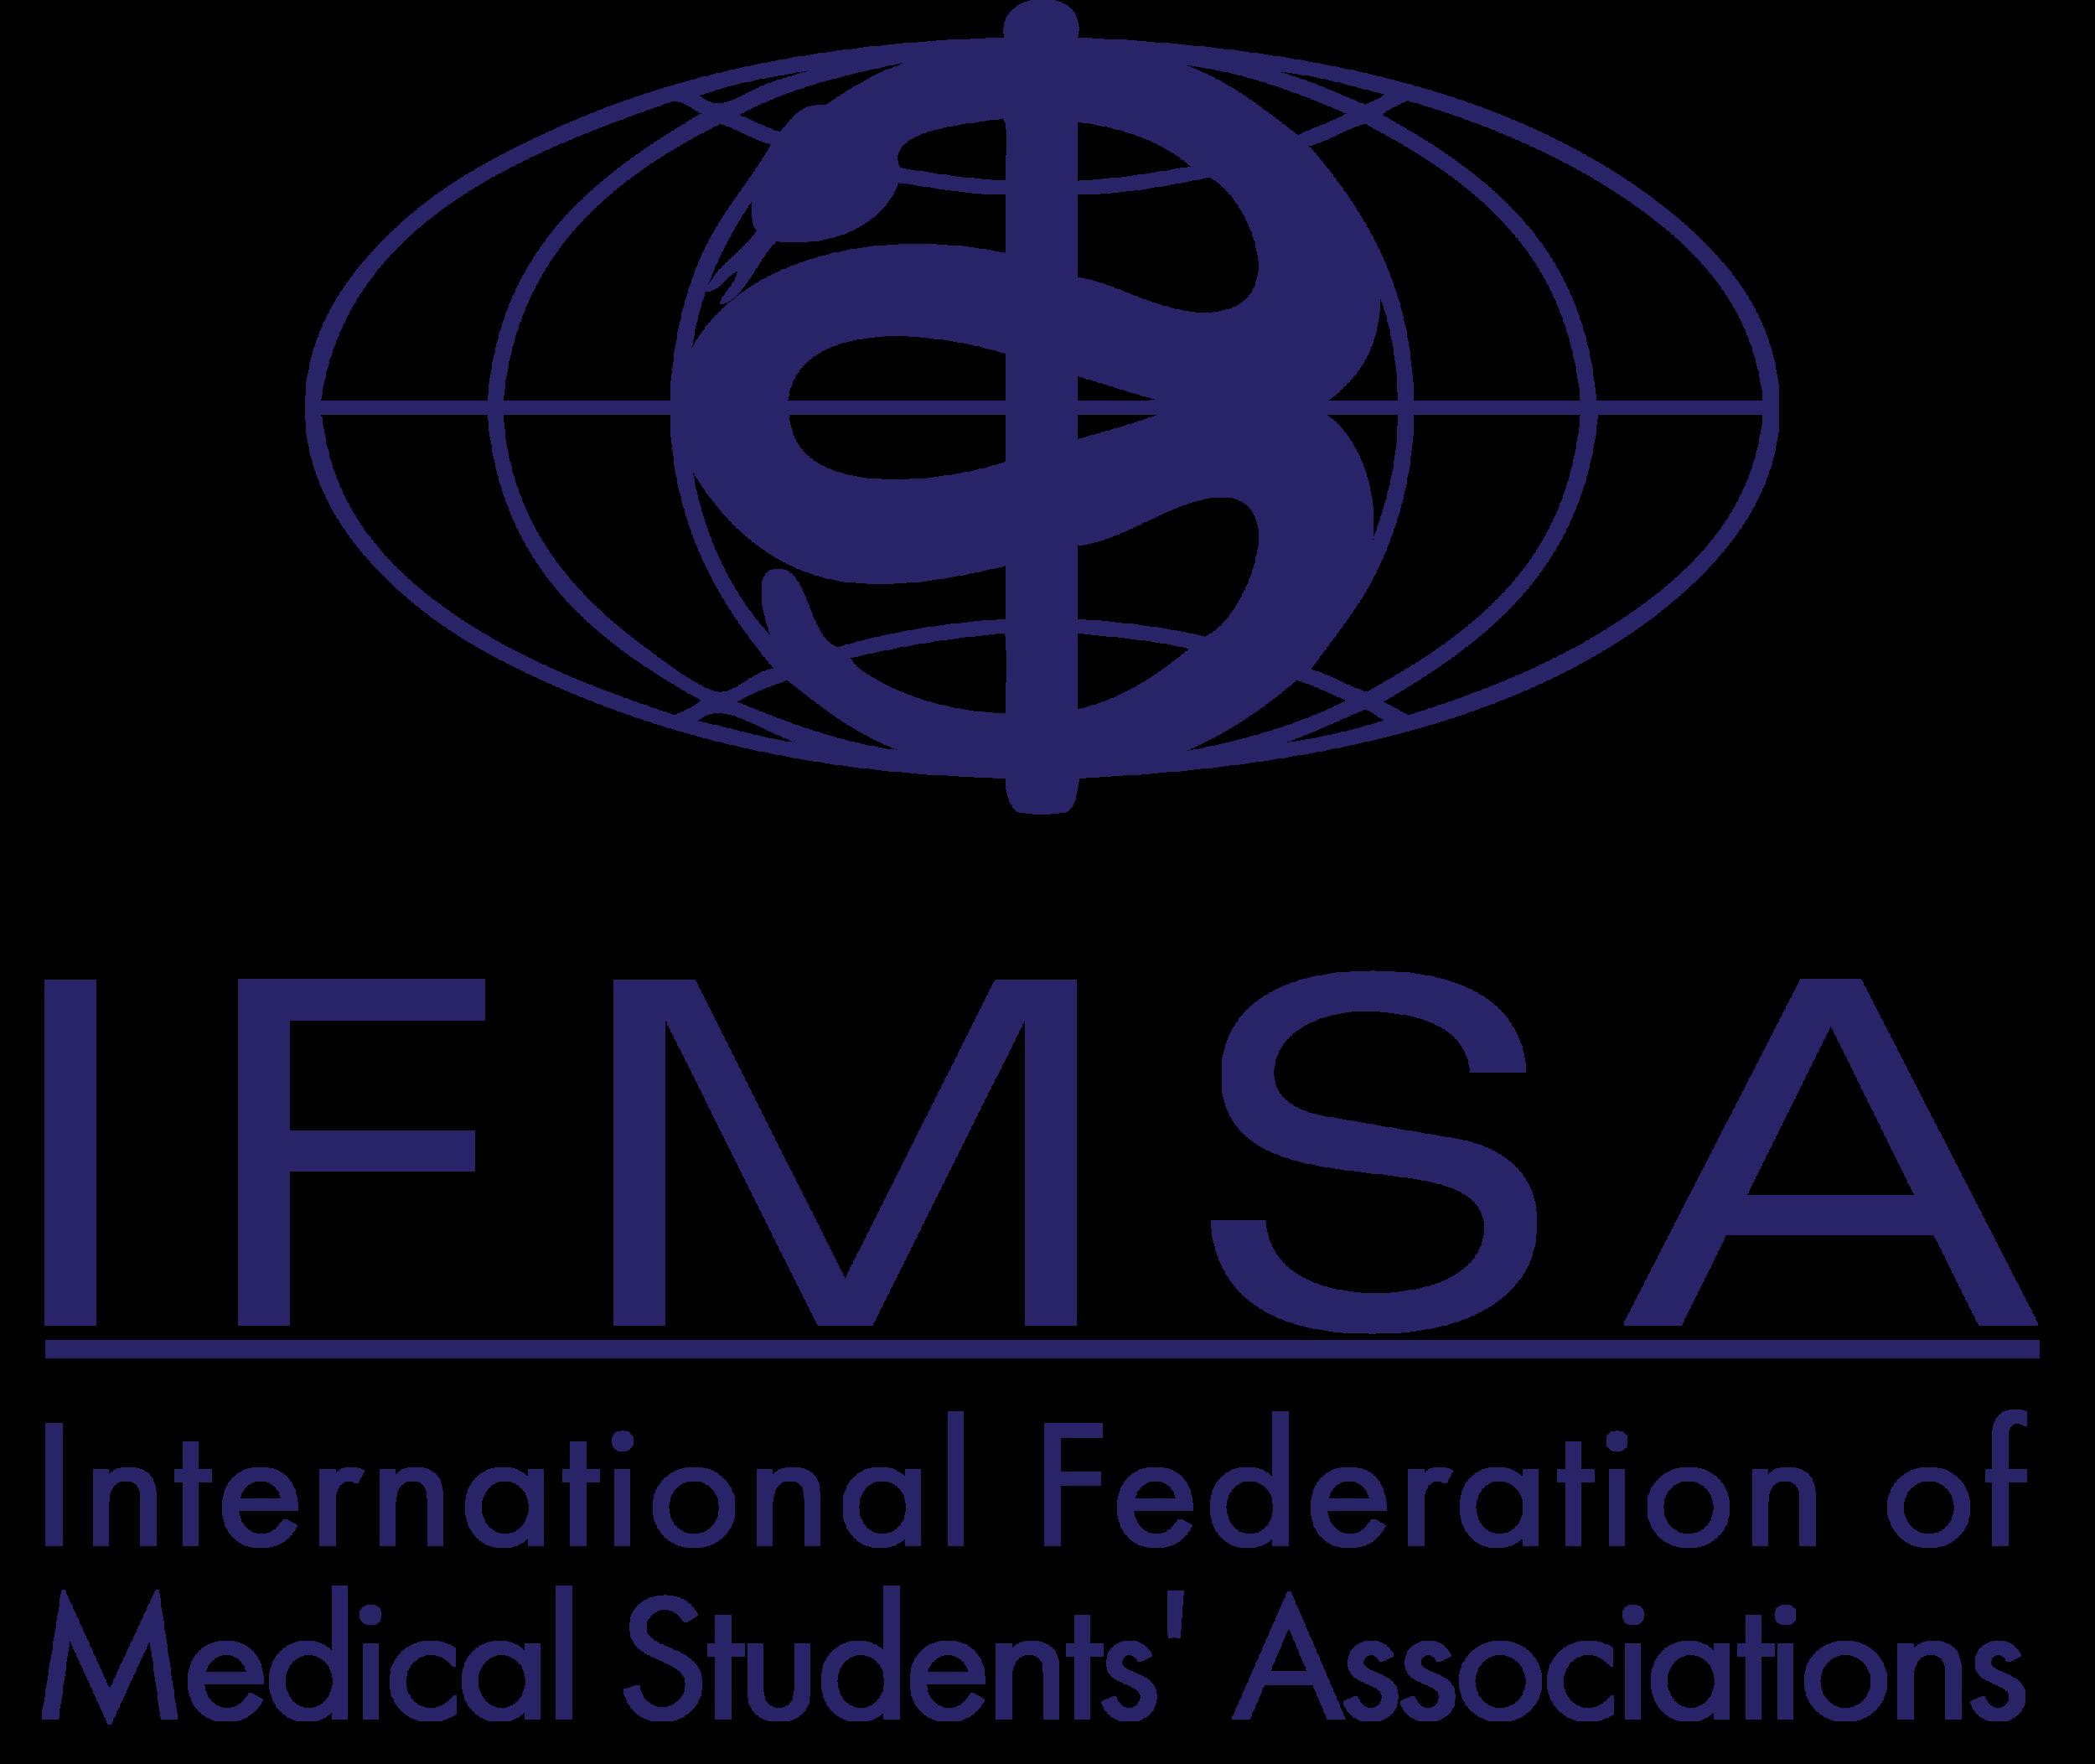 International Federation of Medical Student Associations